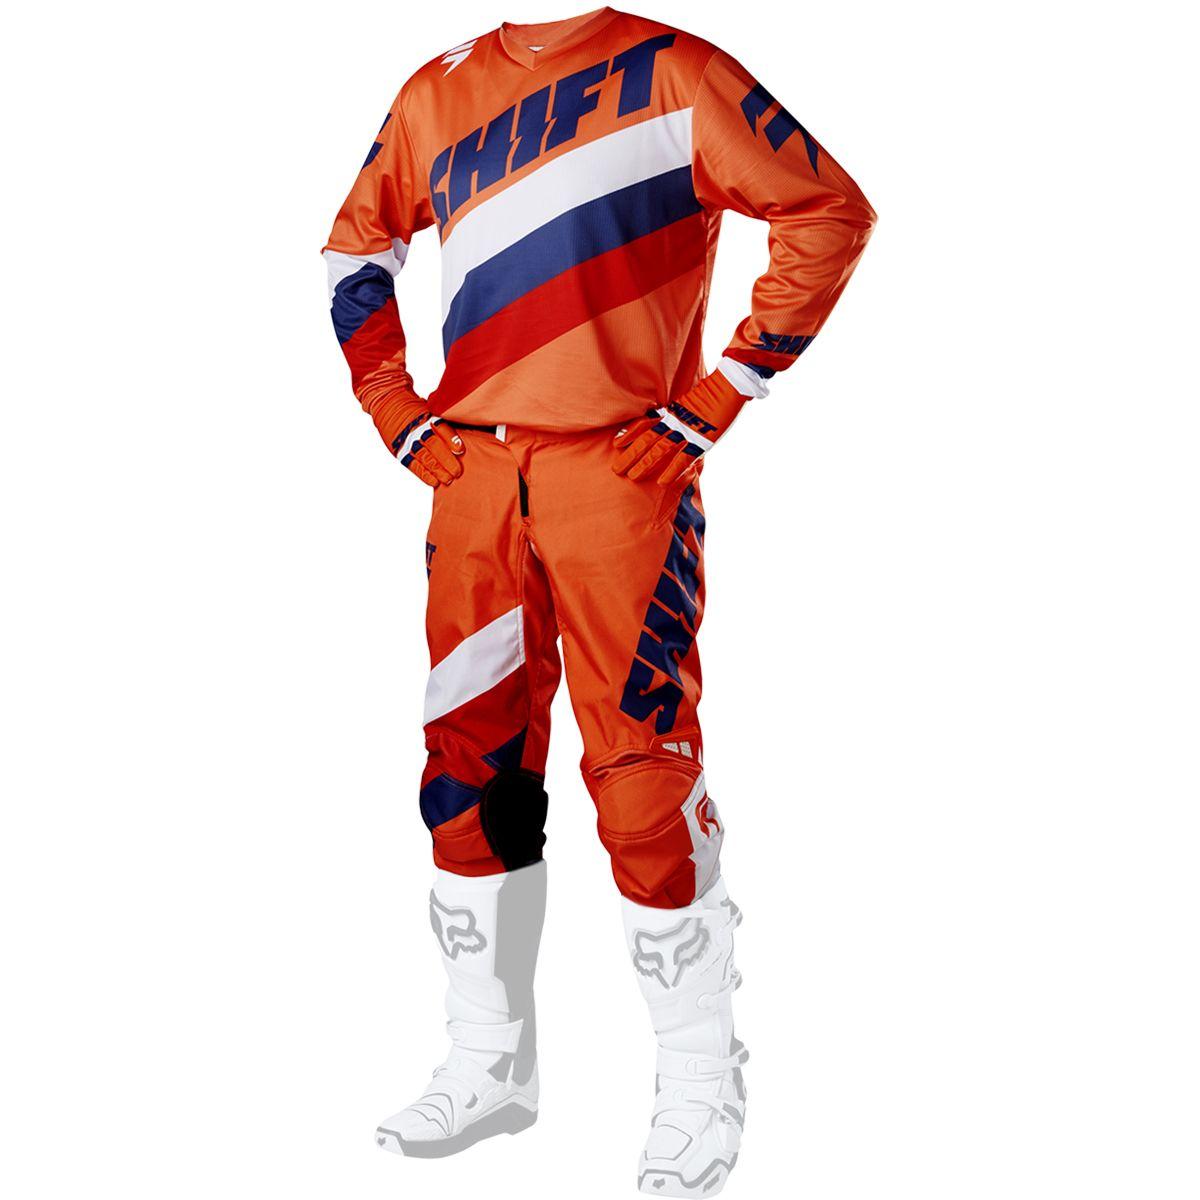 Shift - 2017 WHIT3 Tarmac комплект штаны и джерси, оранжевые